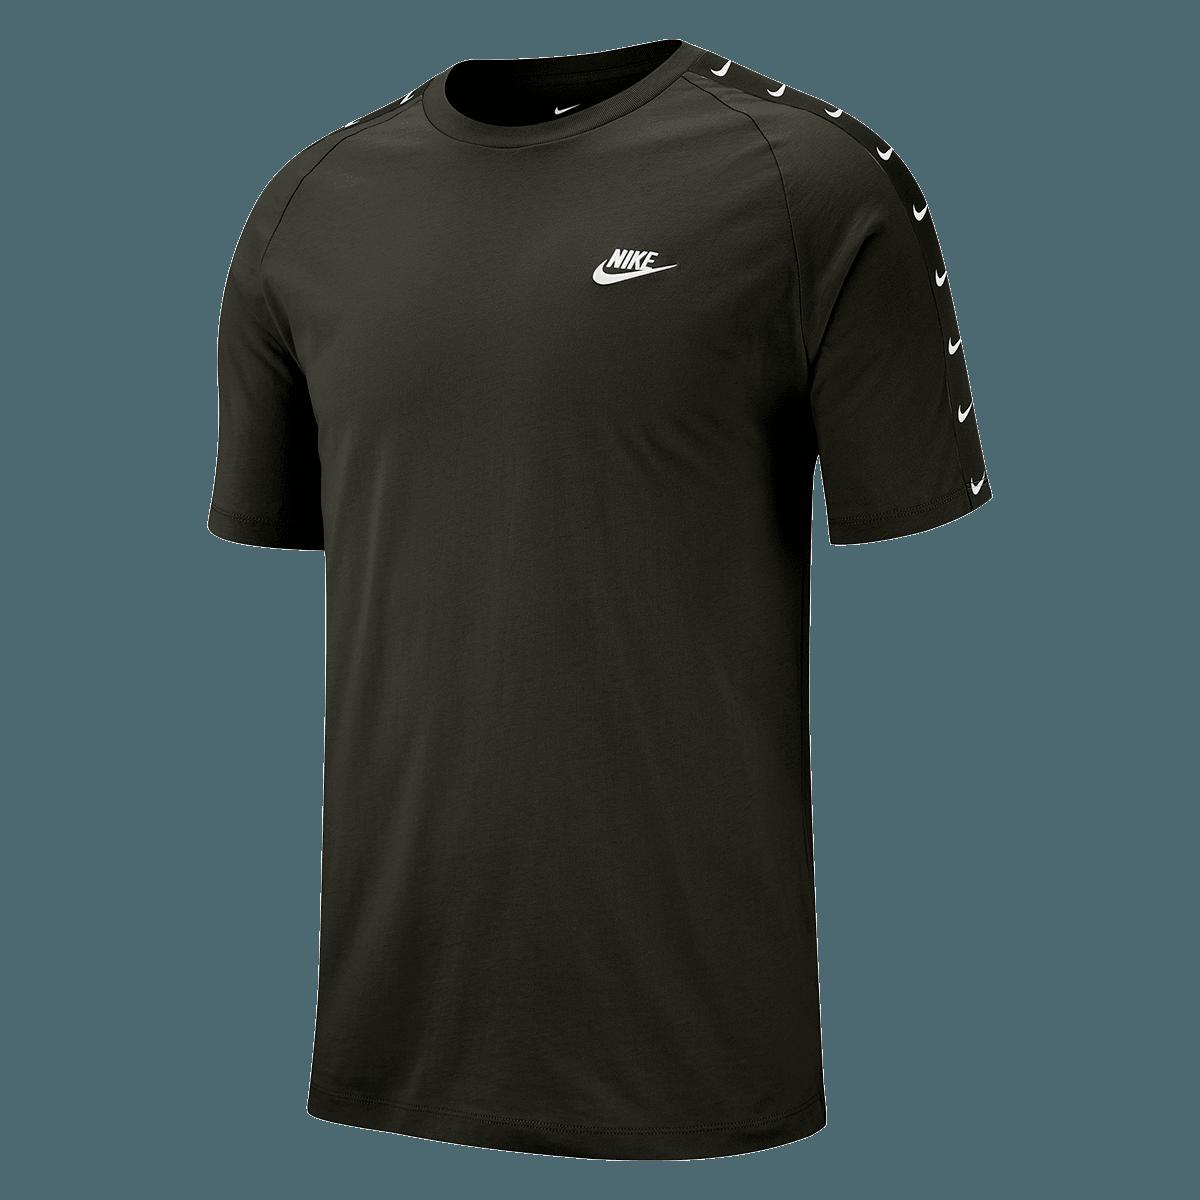 Nike Sportswear Just do it HBR Tee Swoosh II póló